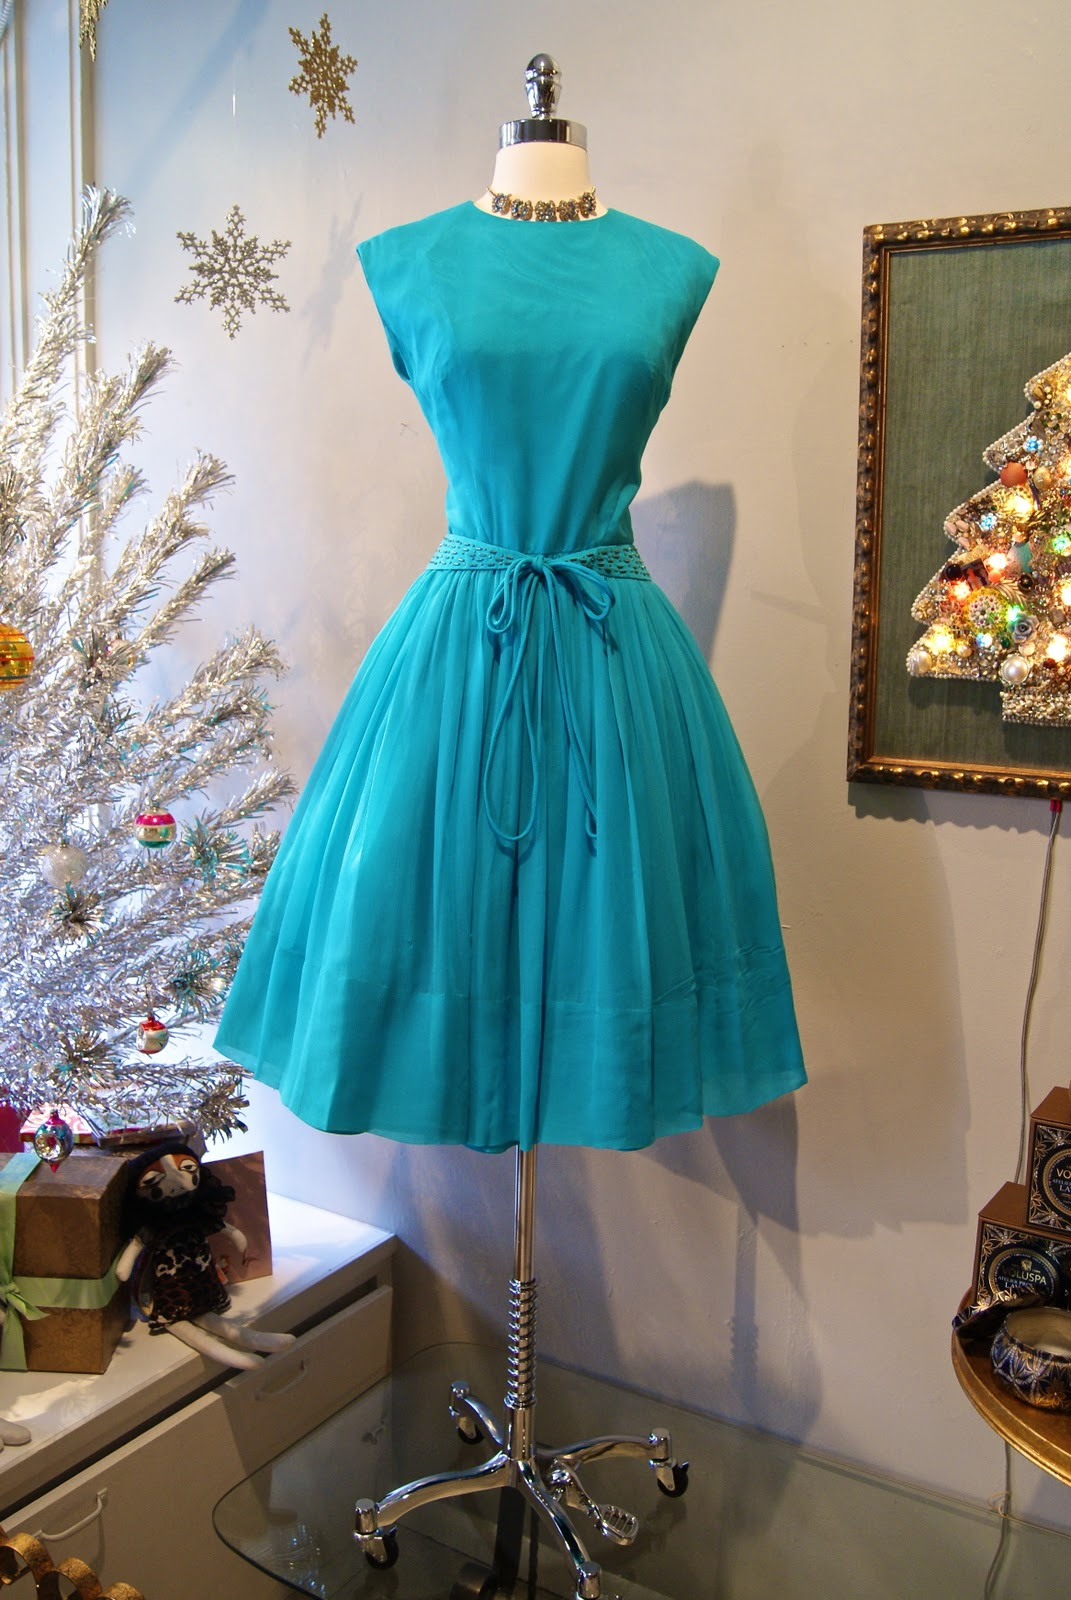 Xtabay Vintage Clothing Boutique - Portland, Oregon: Last Minute ...